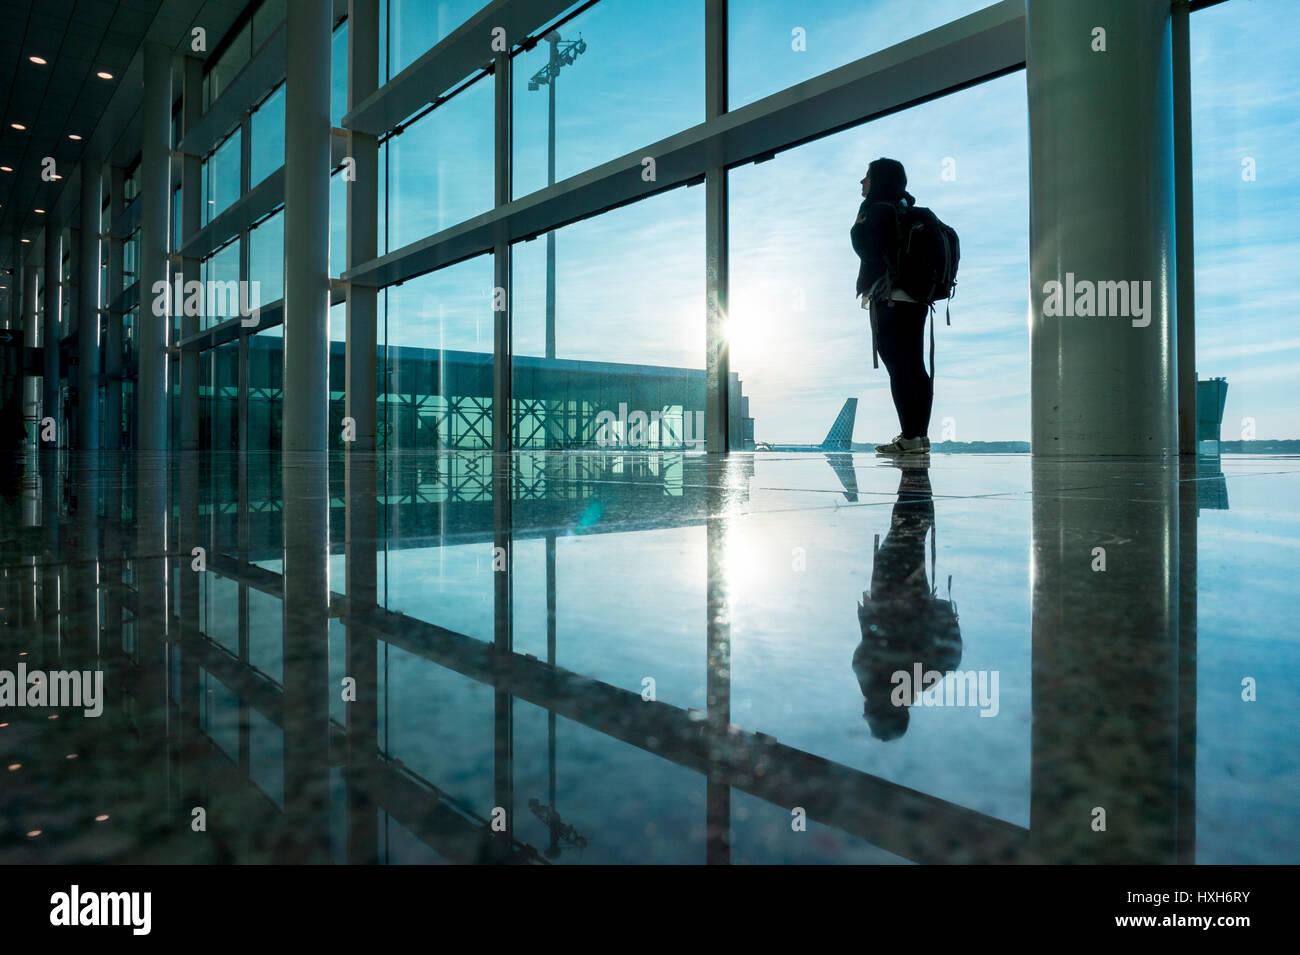 Woman backpacker waiting in El Prat airport, Barcelona - Stock Image